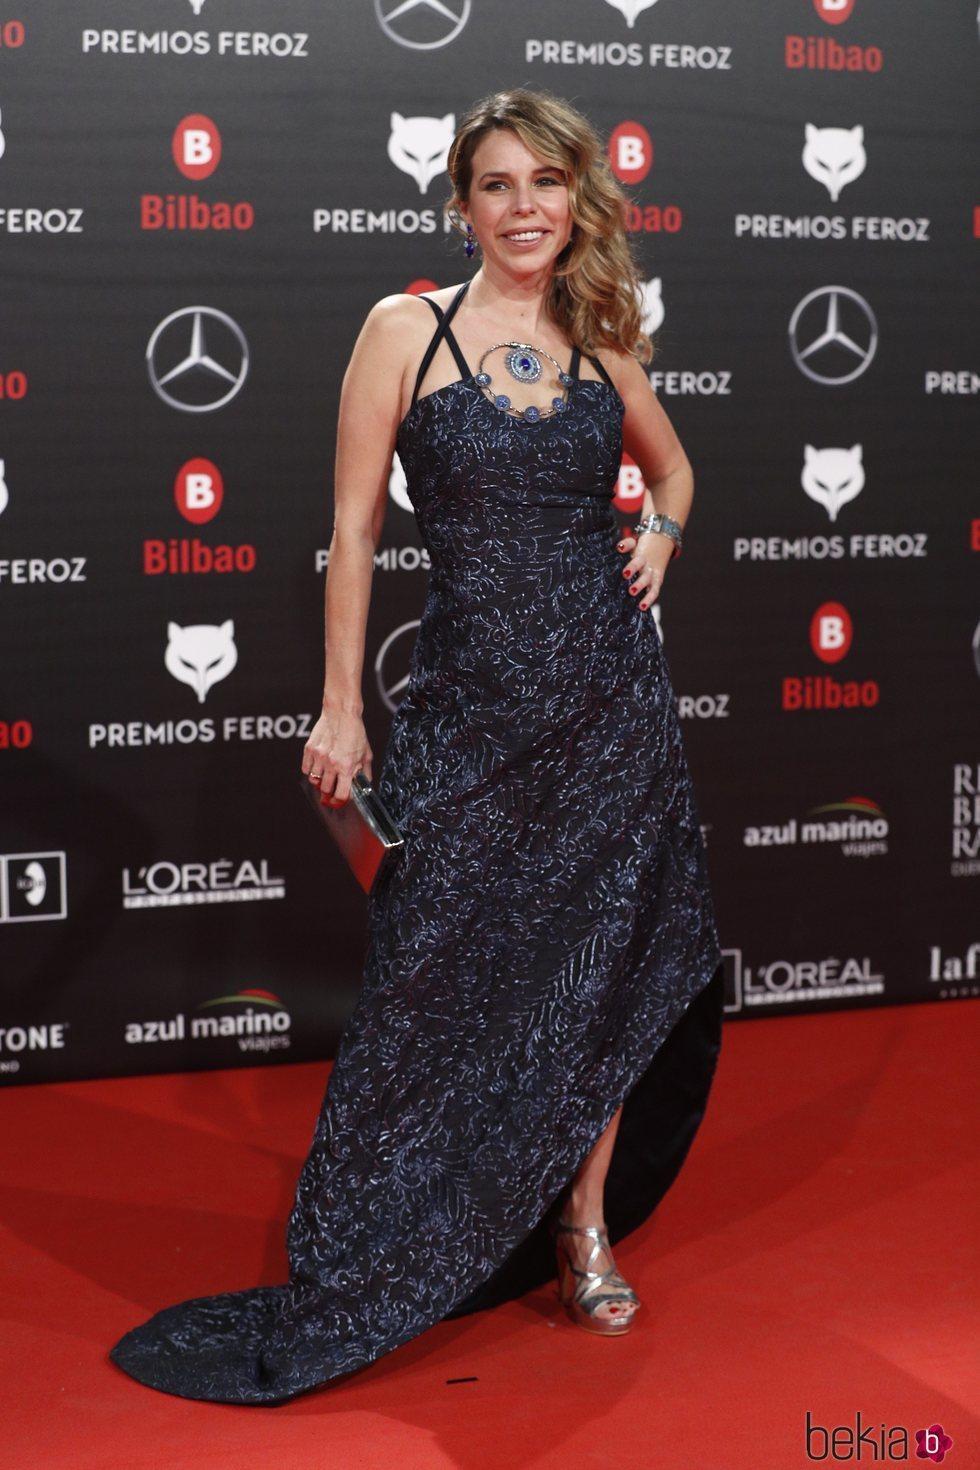 Athenea Mata en los Premios Feroz 2019